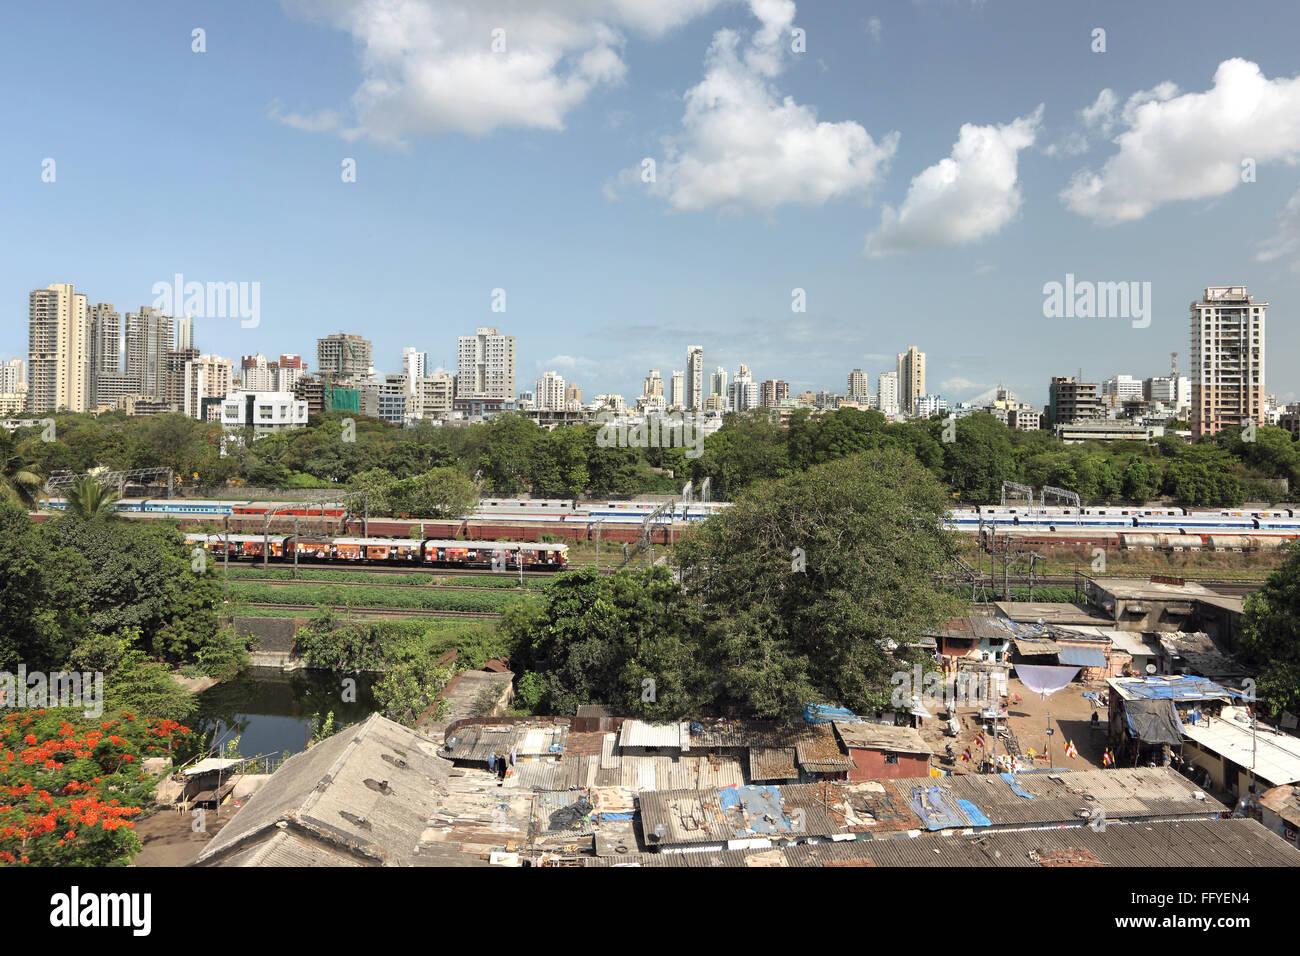 Slum of central and western dadar divided by railway lines ; Bombay Mumbai ; Maharashtra ; India - Stock Image